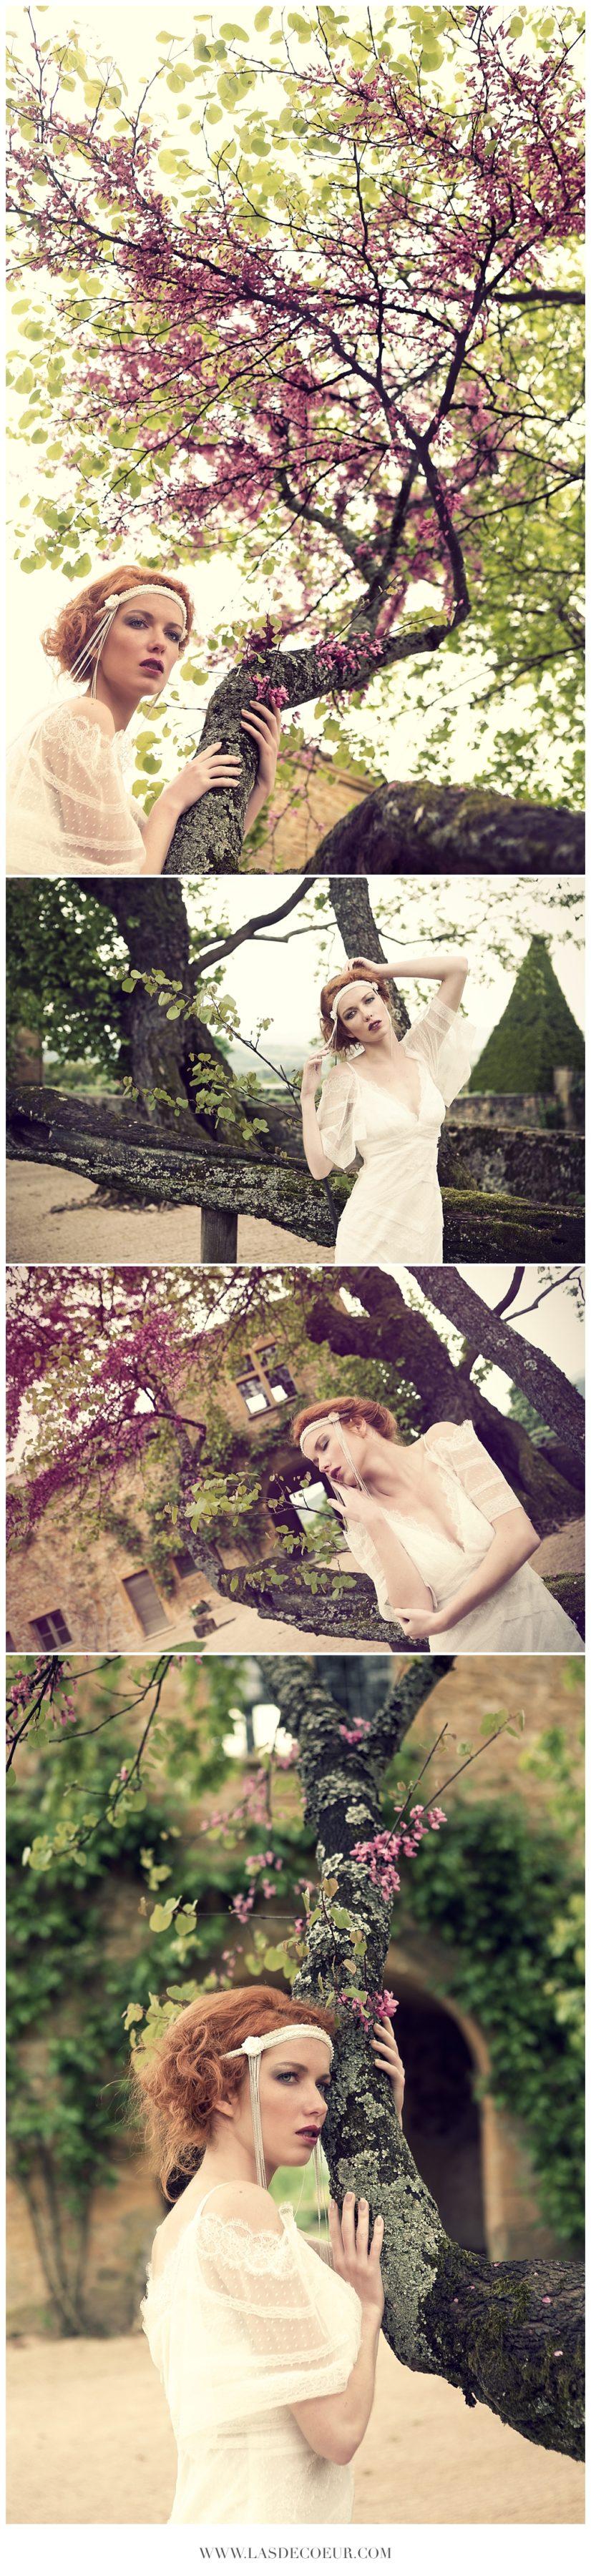 photo mariage glamour©lasdecoeur19